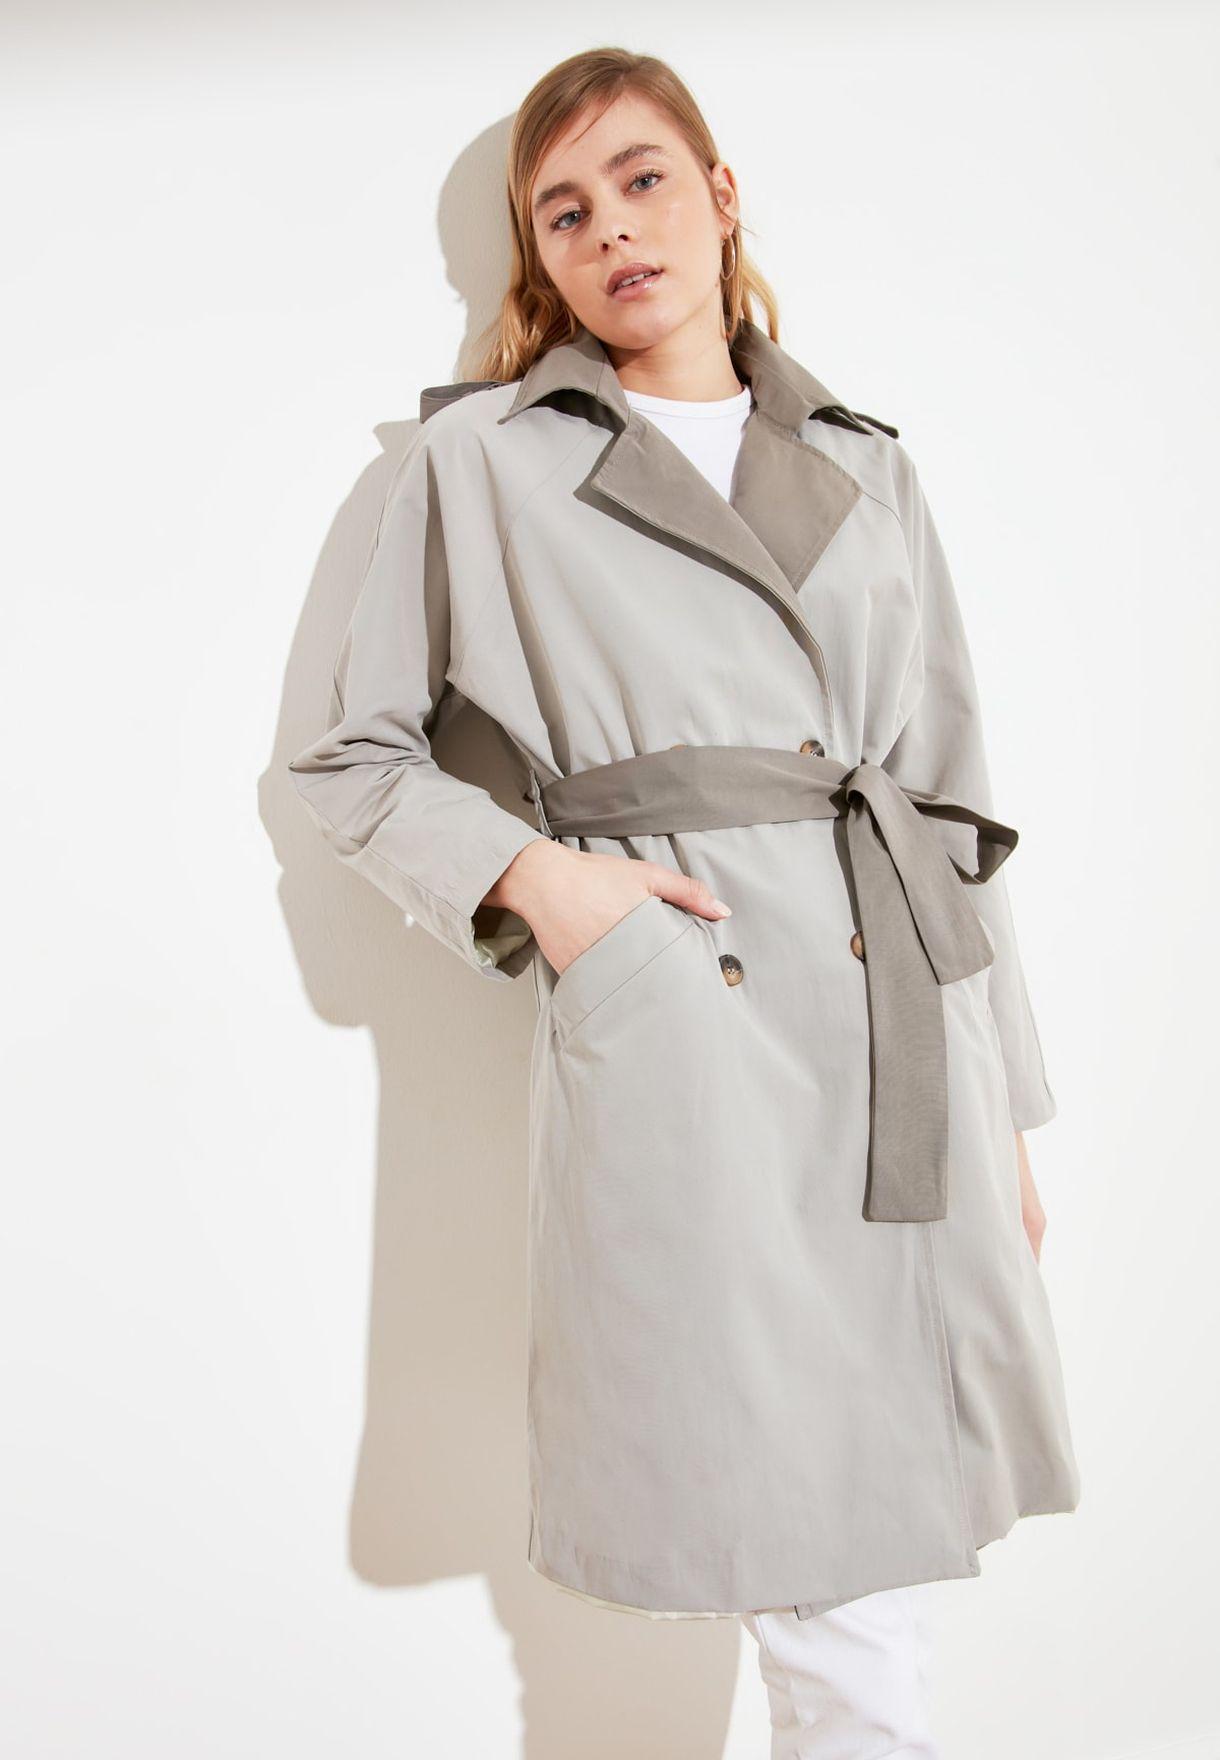 Colorblock Longline Jacket